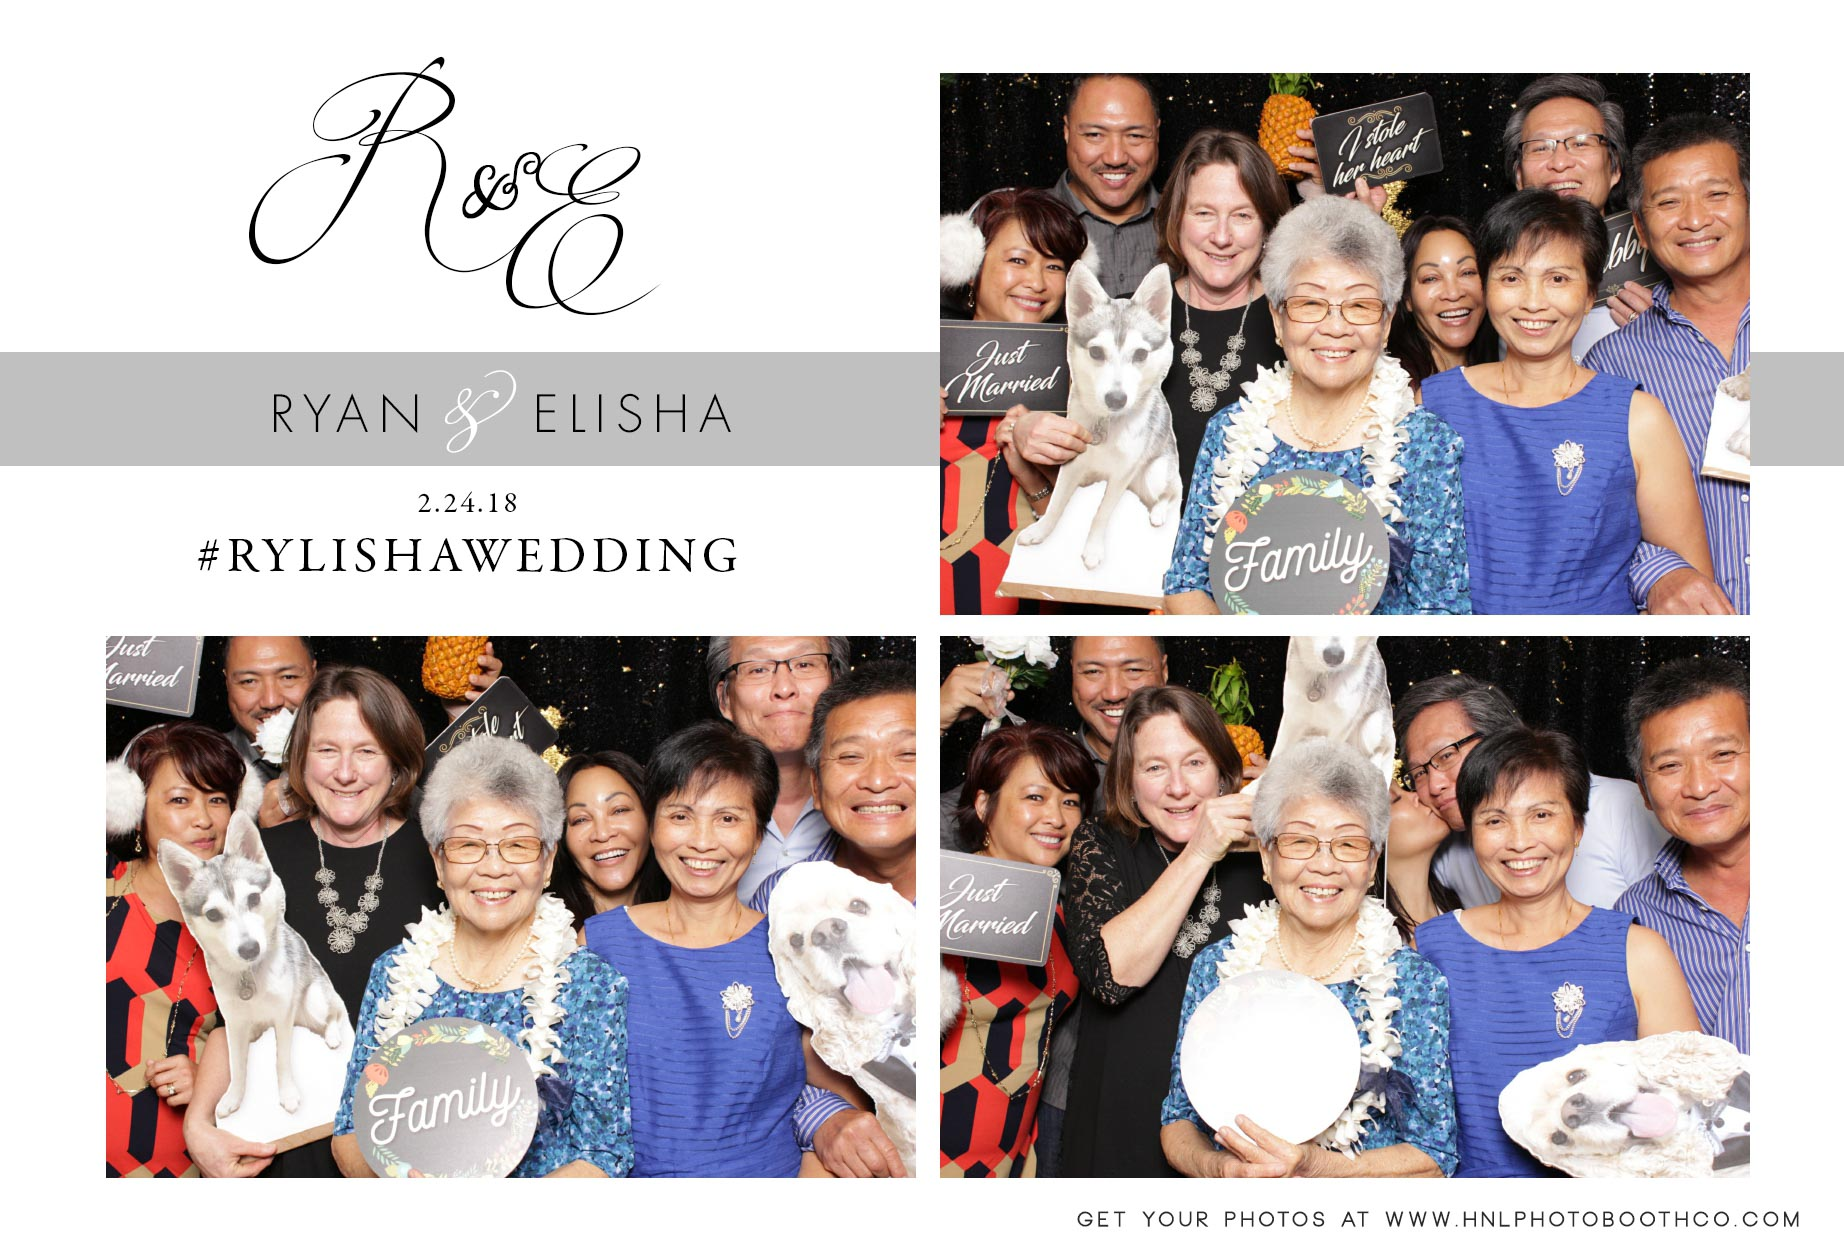 Ryan and Elisha Wedding Hale Koa Hotel Oahu Honolulu Hawaii (17 of 57).jpg